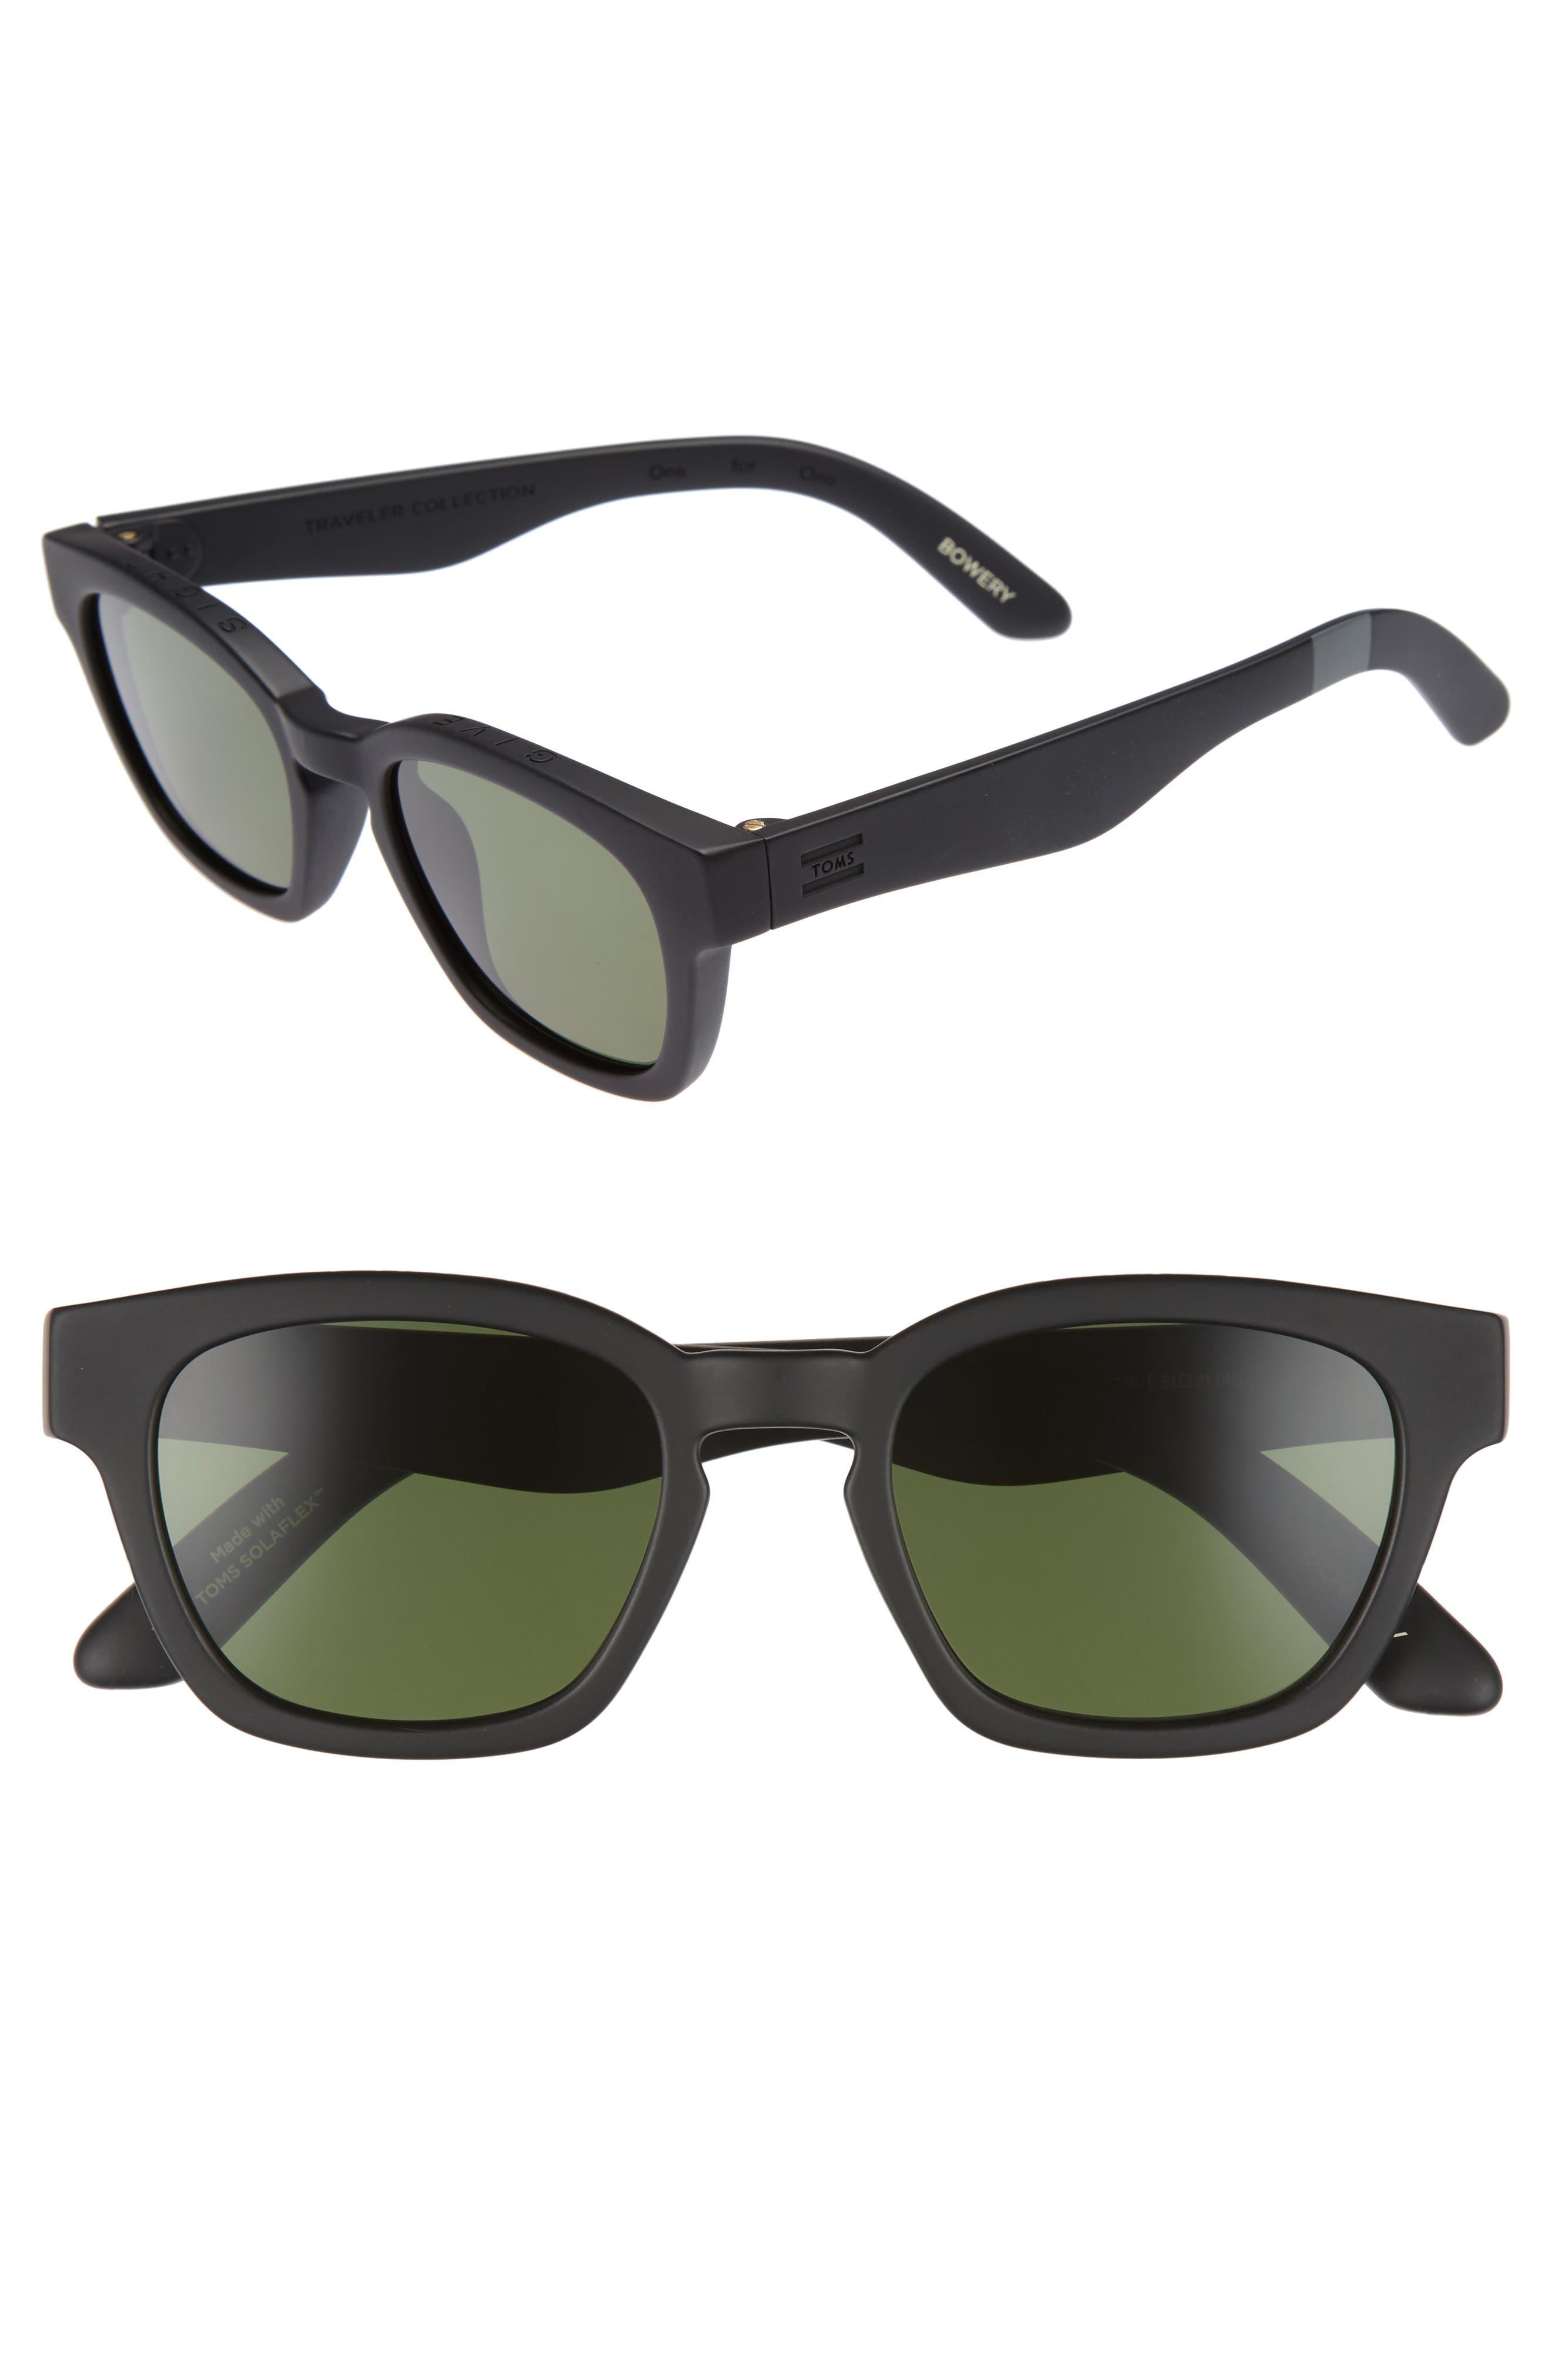 Main Image - TOMS Bowery 51mm Polarized Sunglasses